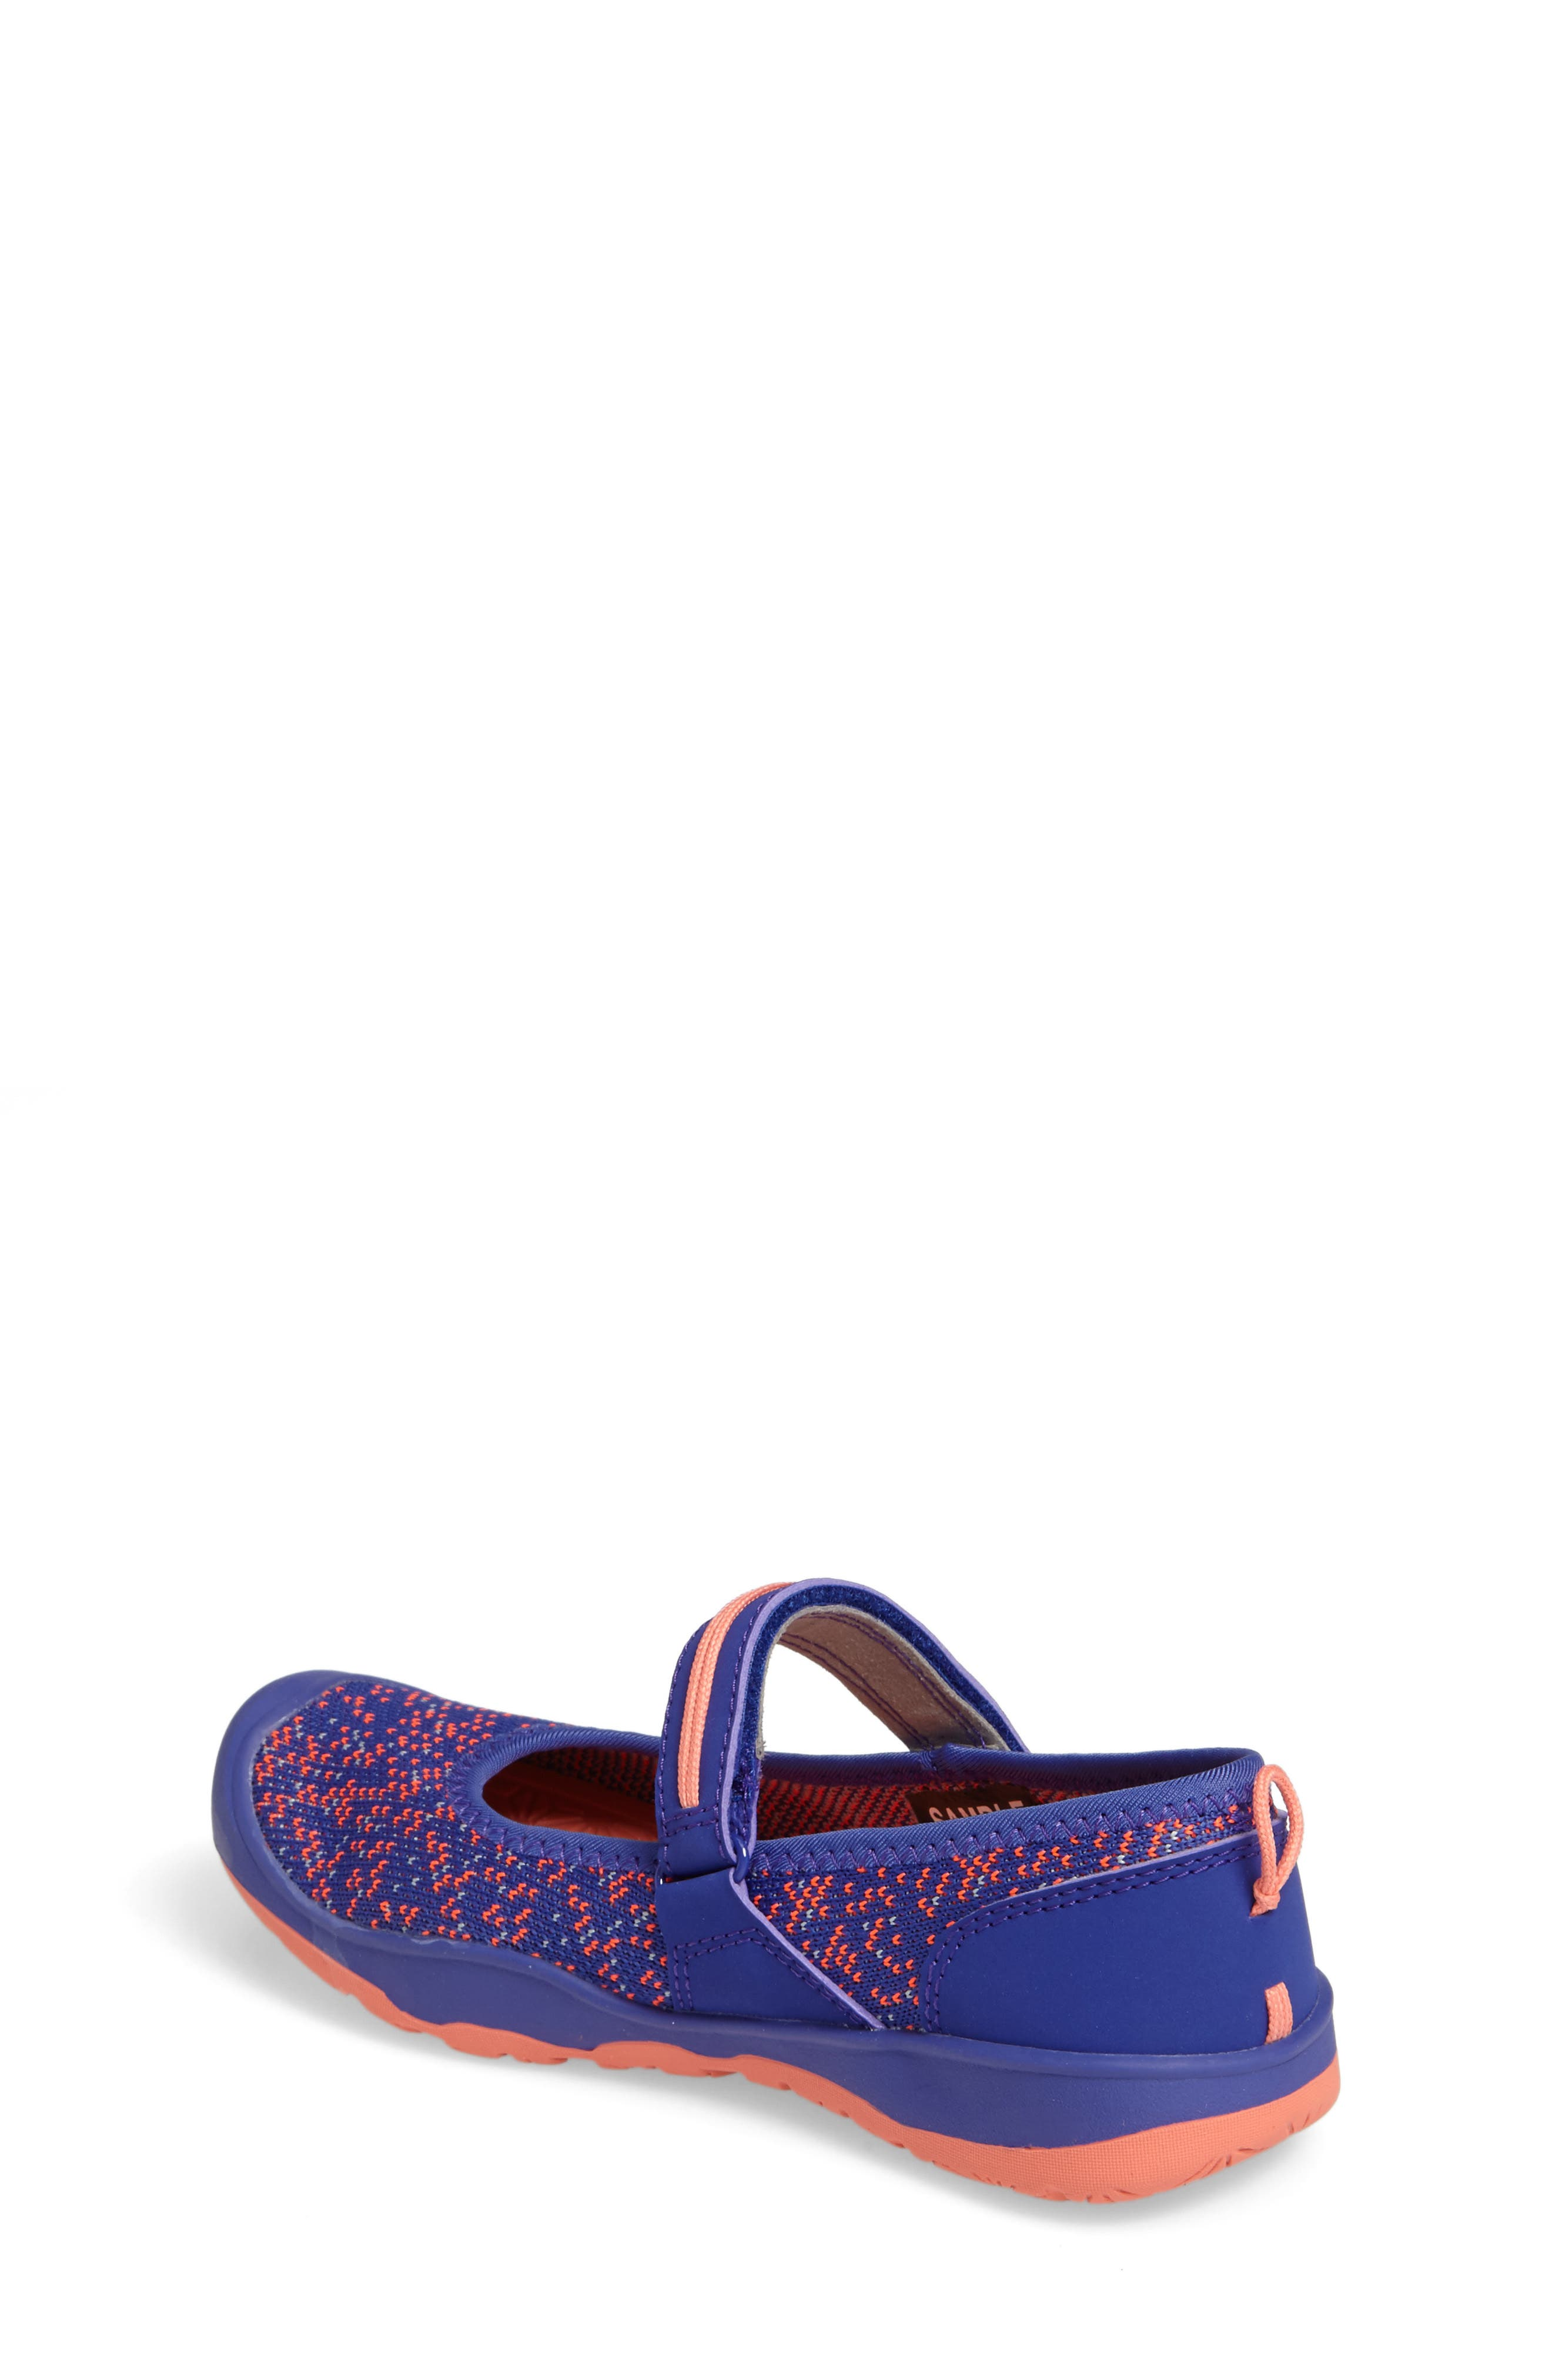 Moxie Mary Jane,                             Alternate thumbnail 2, color,                             Purple/ Fusion Coral